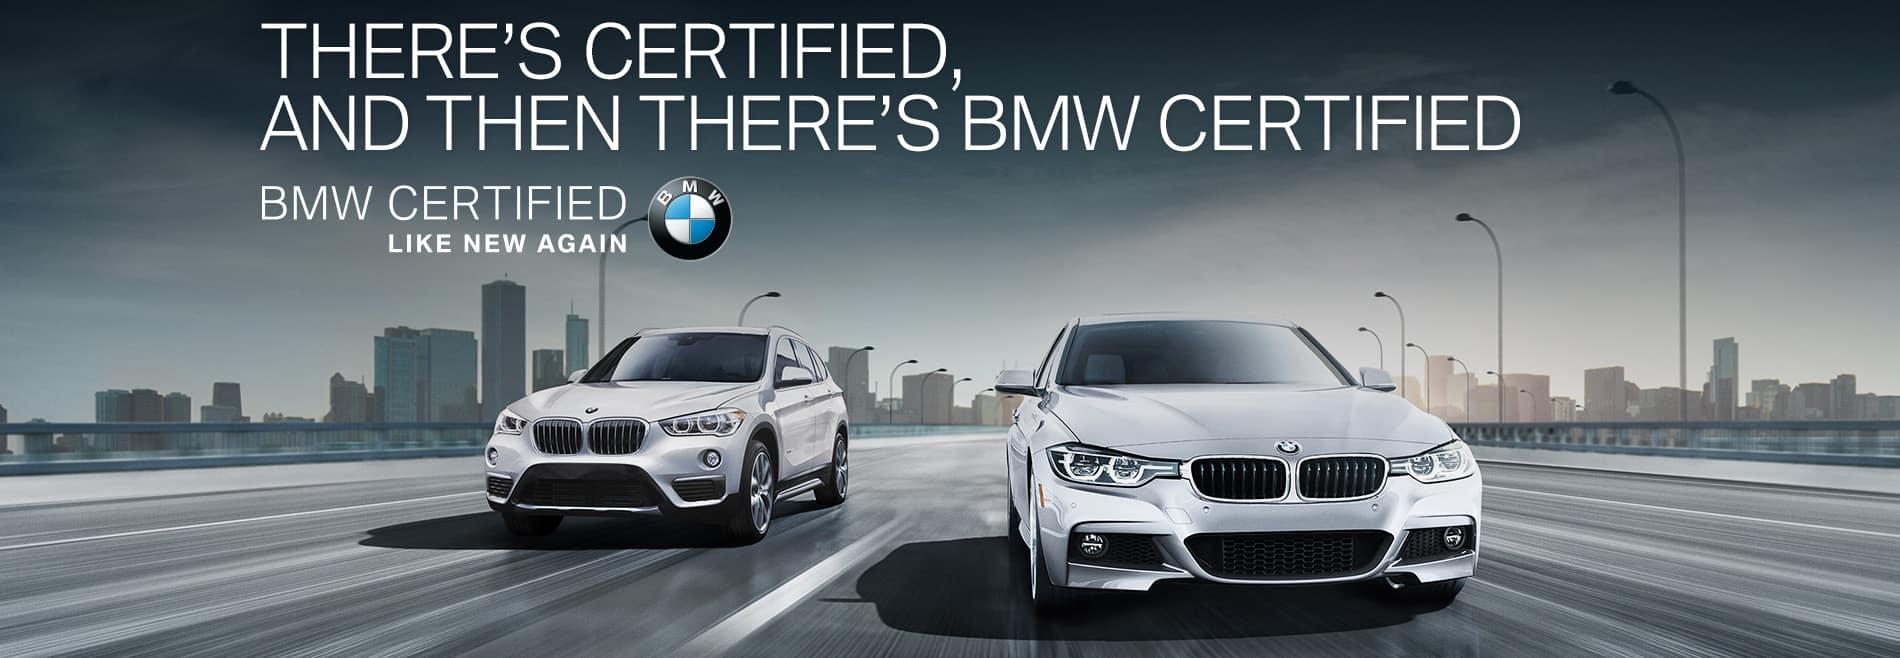 certified-bmw-graser-military-bmw-sales